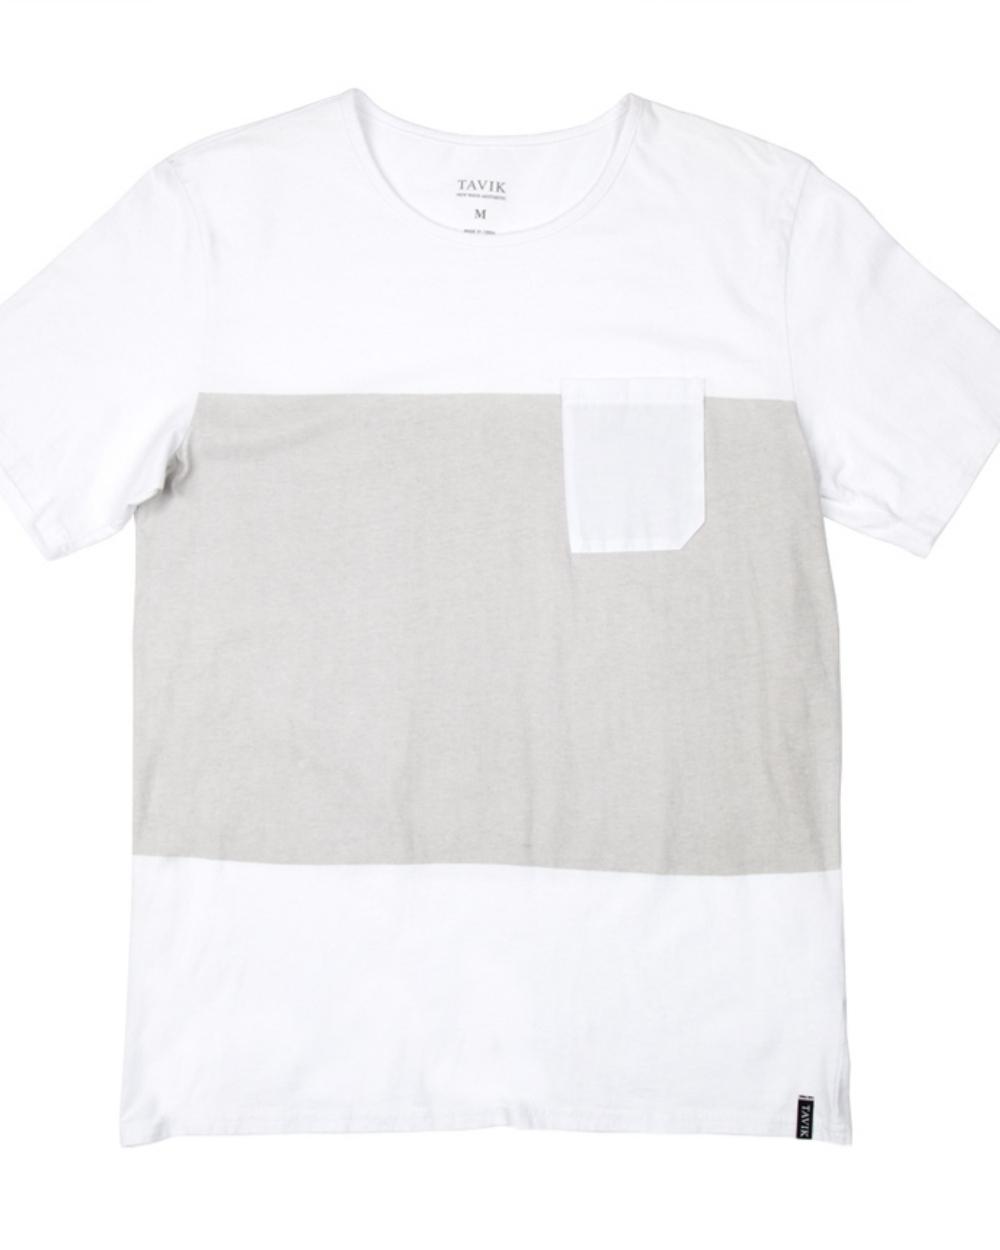 2015 Tavik Men's White Lux Knit